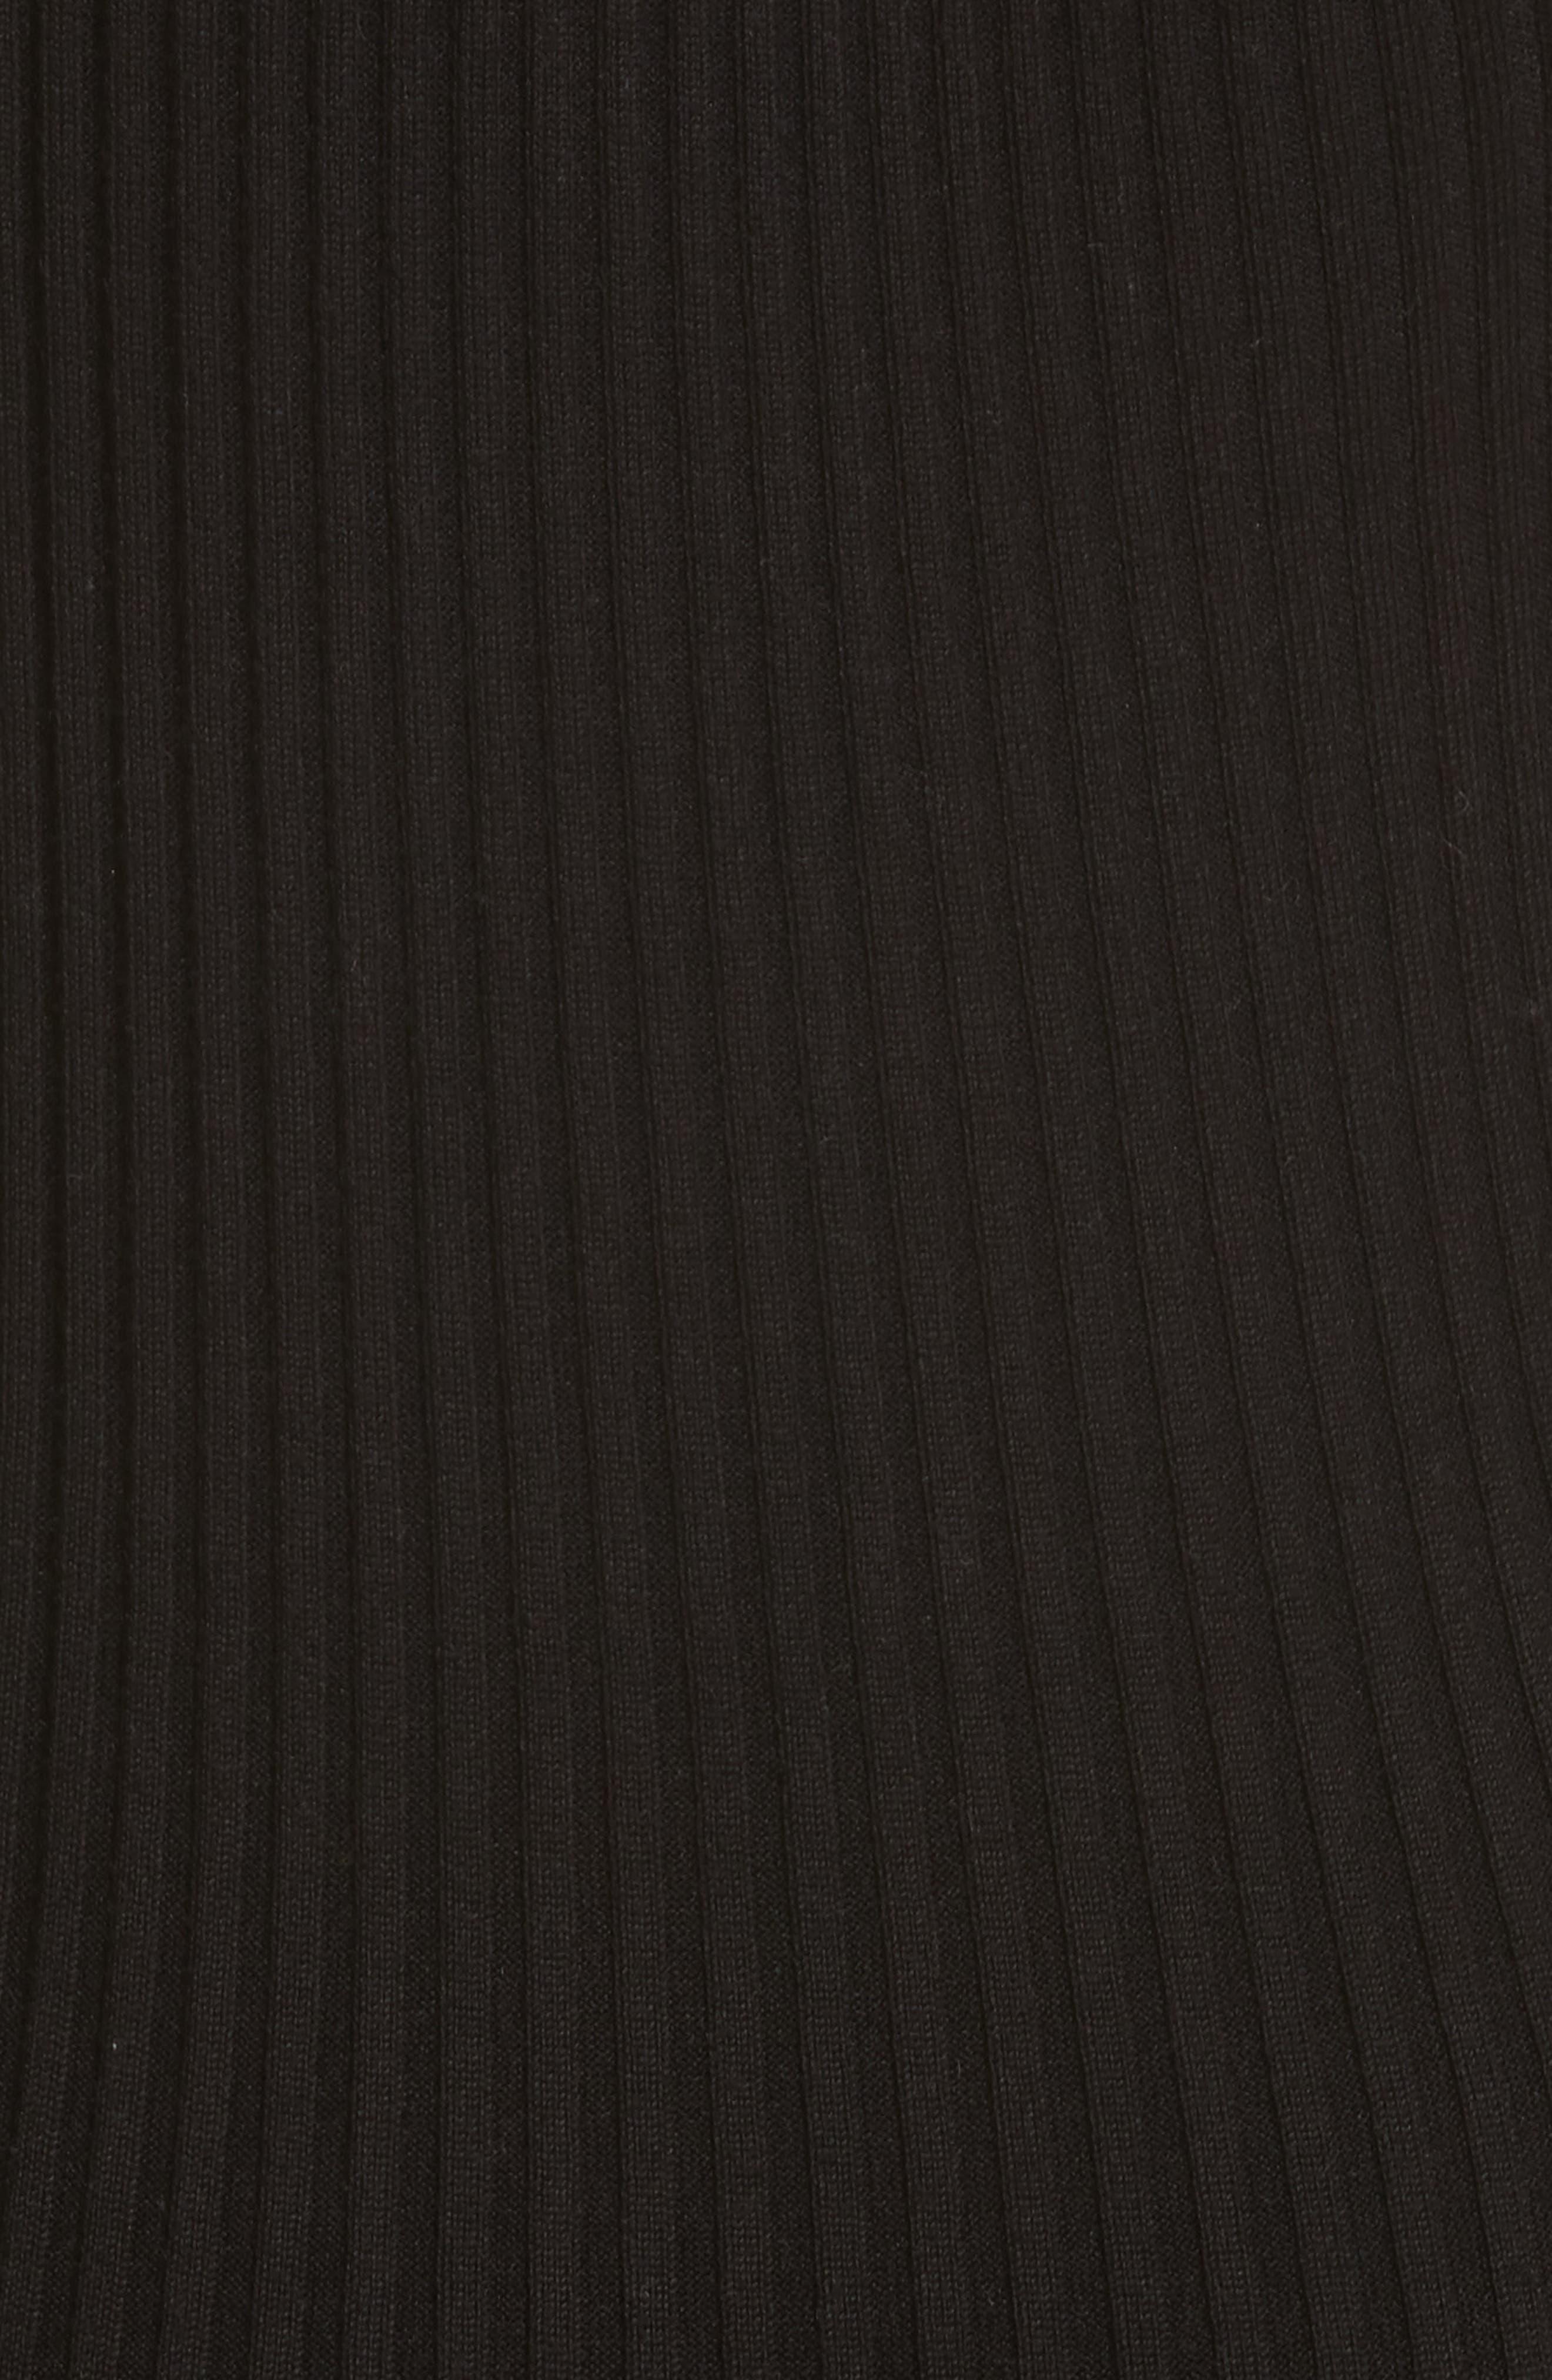 Knit Stretch Silk One-Shoulder Dress,                             Alternate thumbnail 5, color,                             001